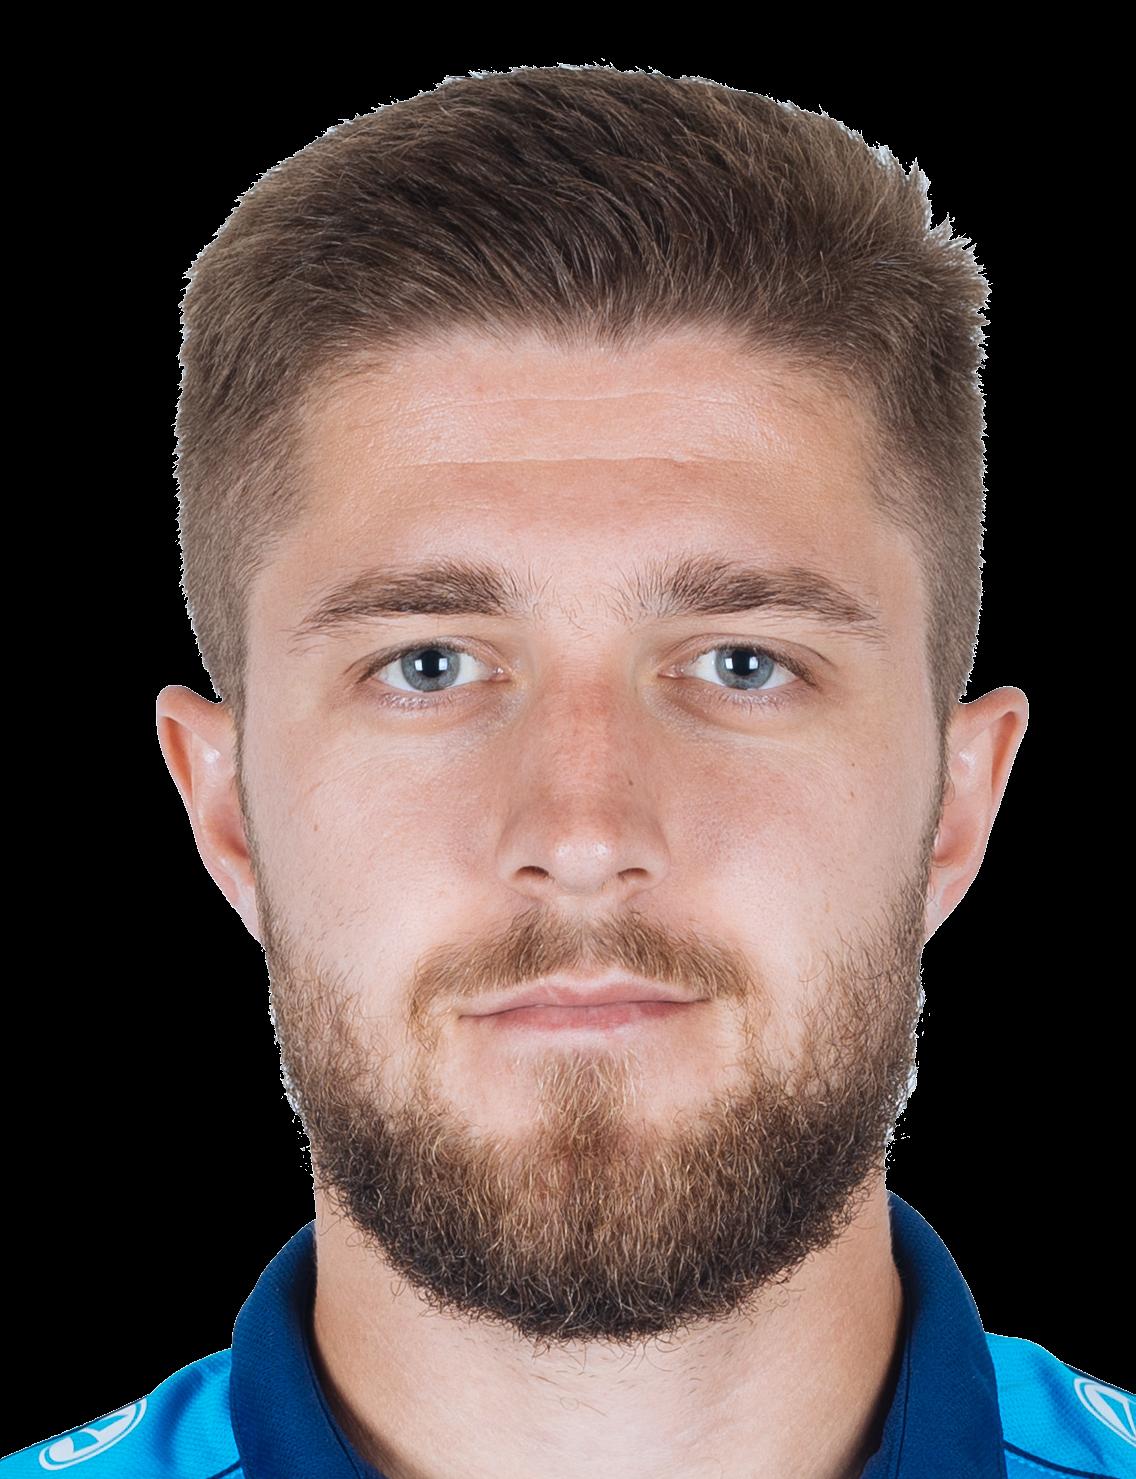 Vladimir Azarov Player Profile 19 20 Transfermarkt Images, Photos, Reviews